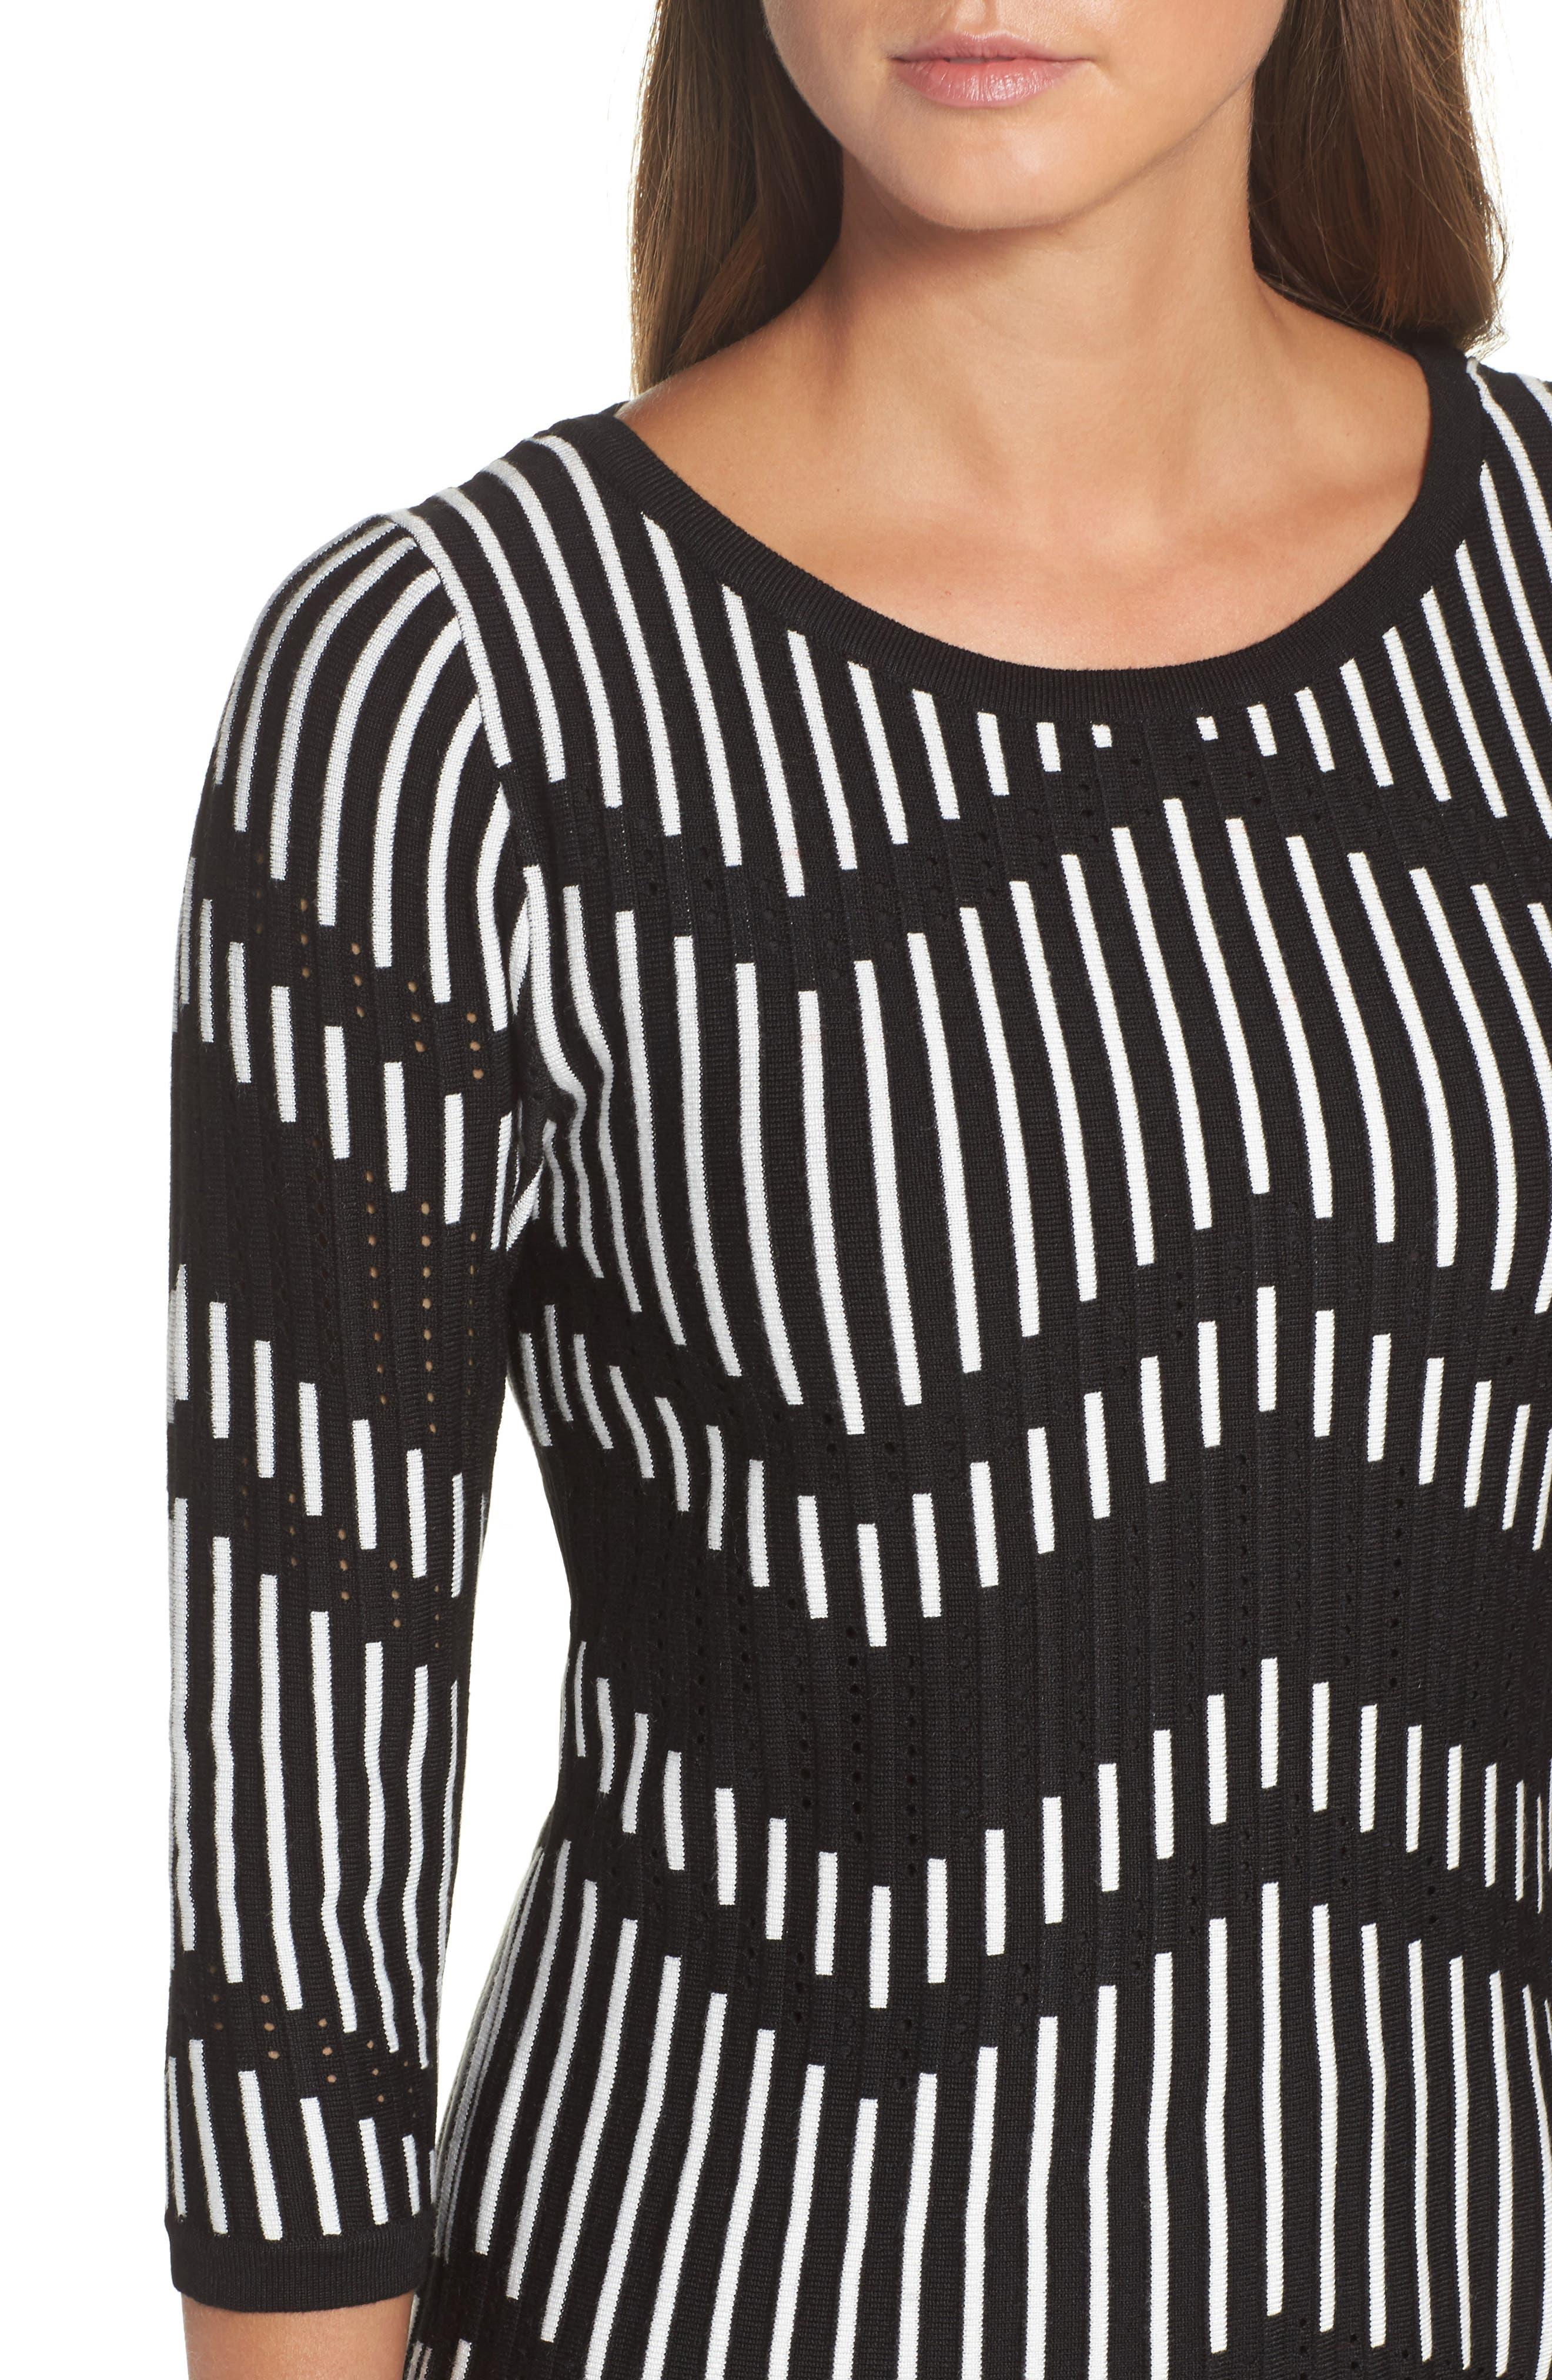 Zig Zag Sweater Dress,                             Alternate thumbnail 4, color,                             001